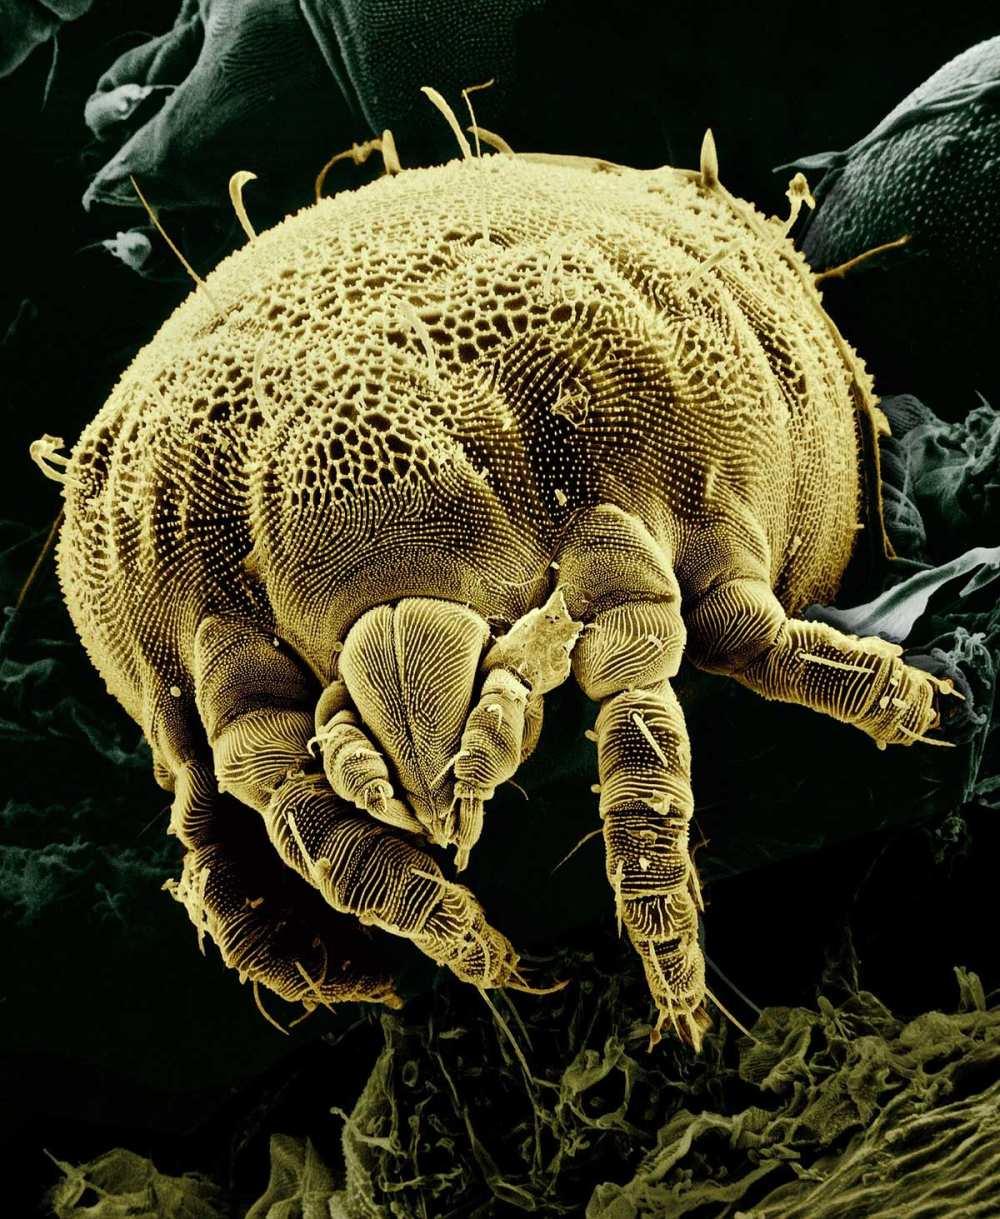 gwne yellow mite 847873 1920